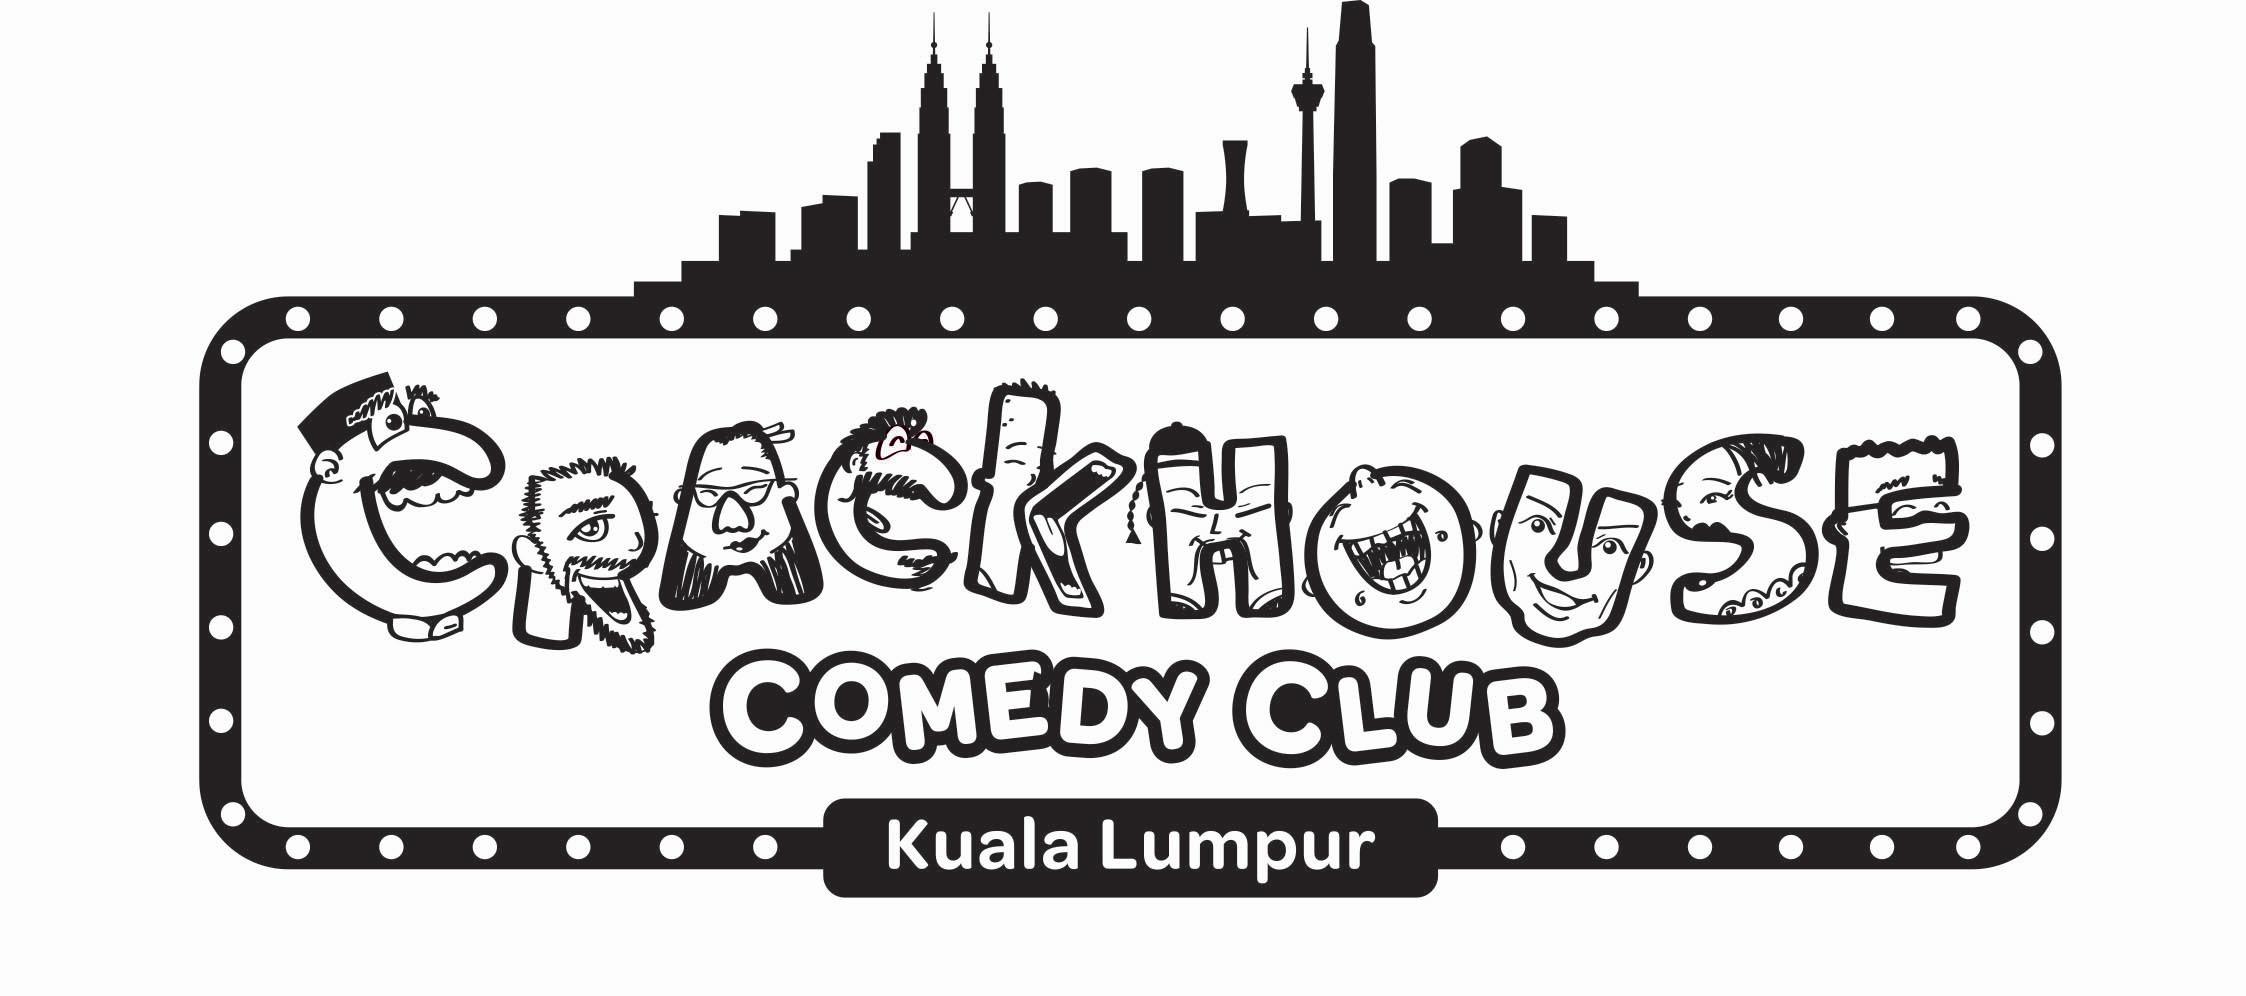 The Crackhouse Comedy Club Kuala Lumpur | Malaysia's First